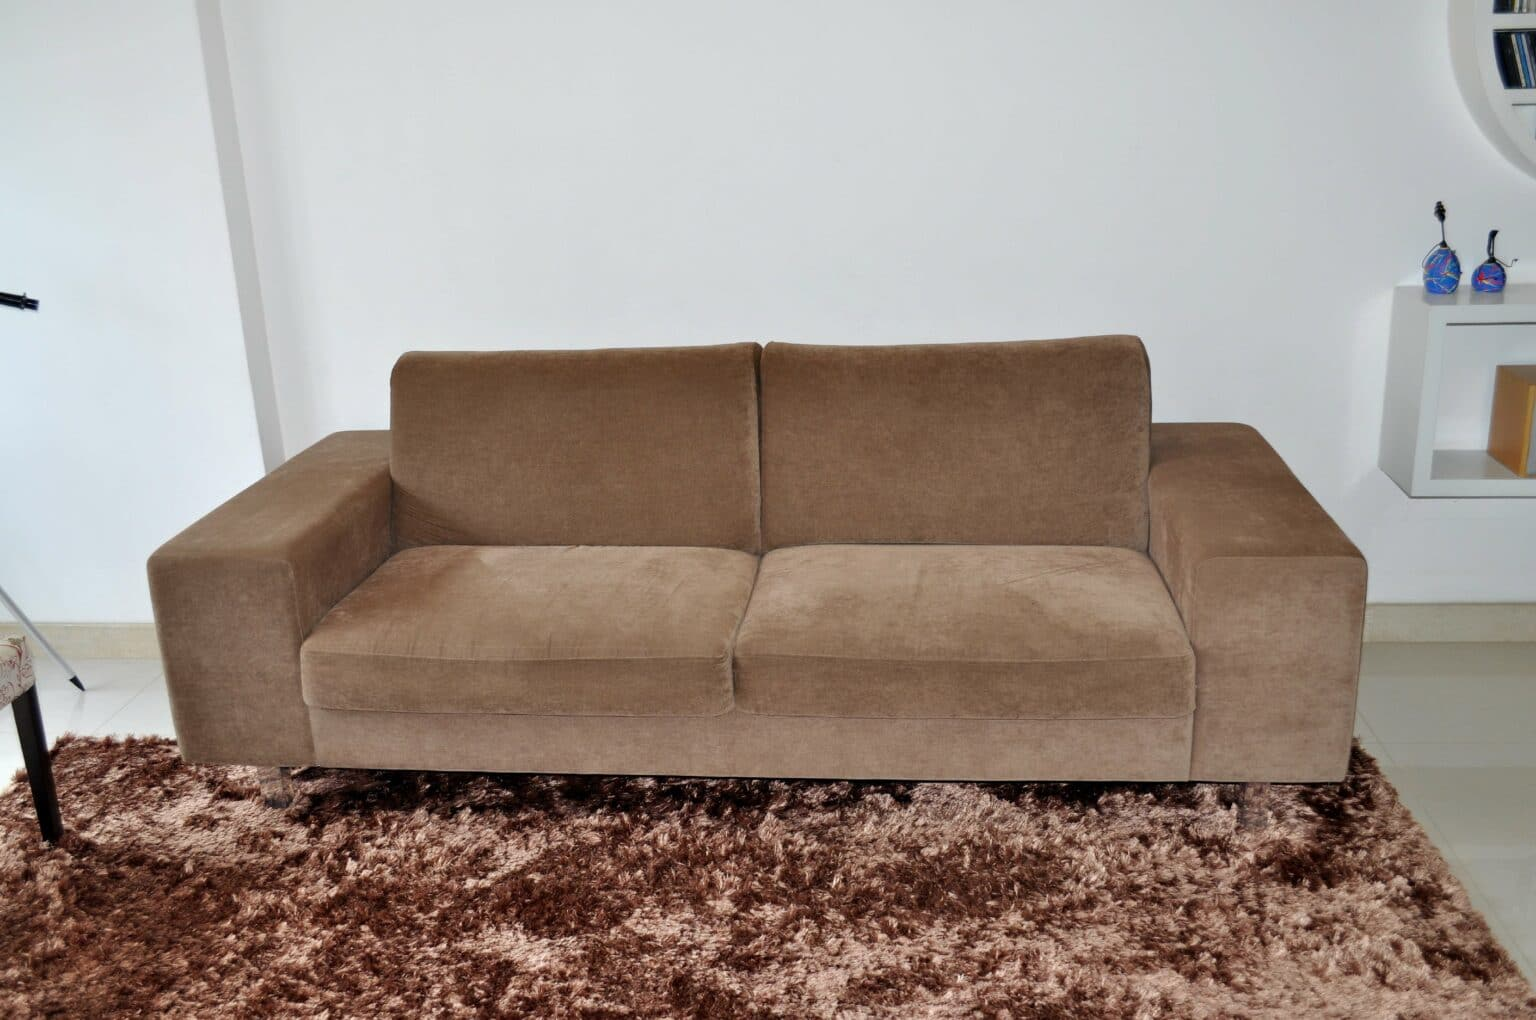 Sofá e tapete felpudo marrons. Imagem ilustrativa texto sofá sujo.